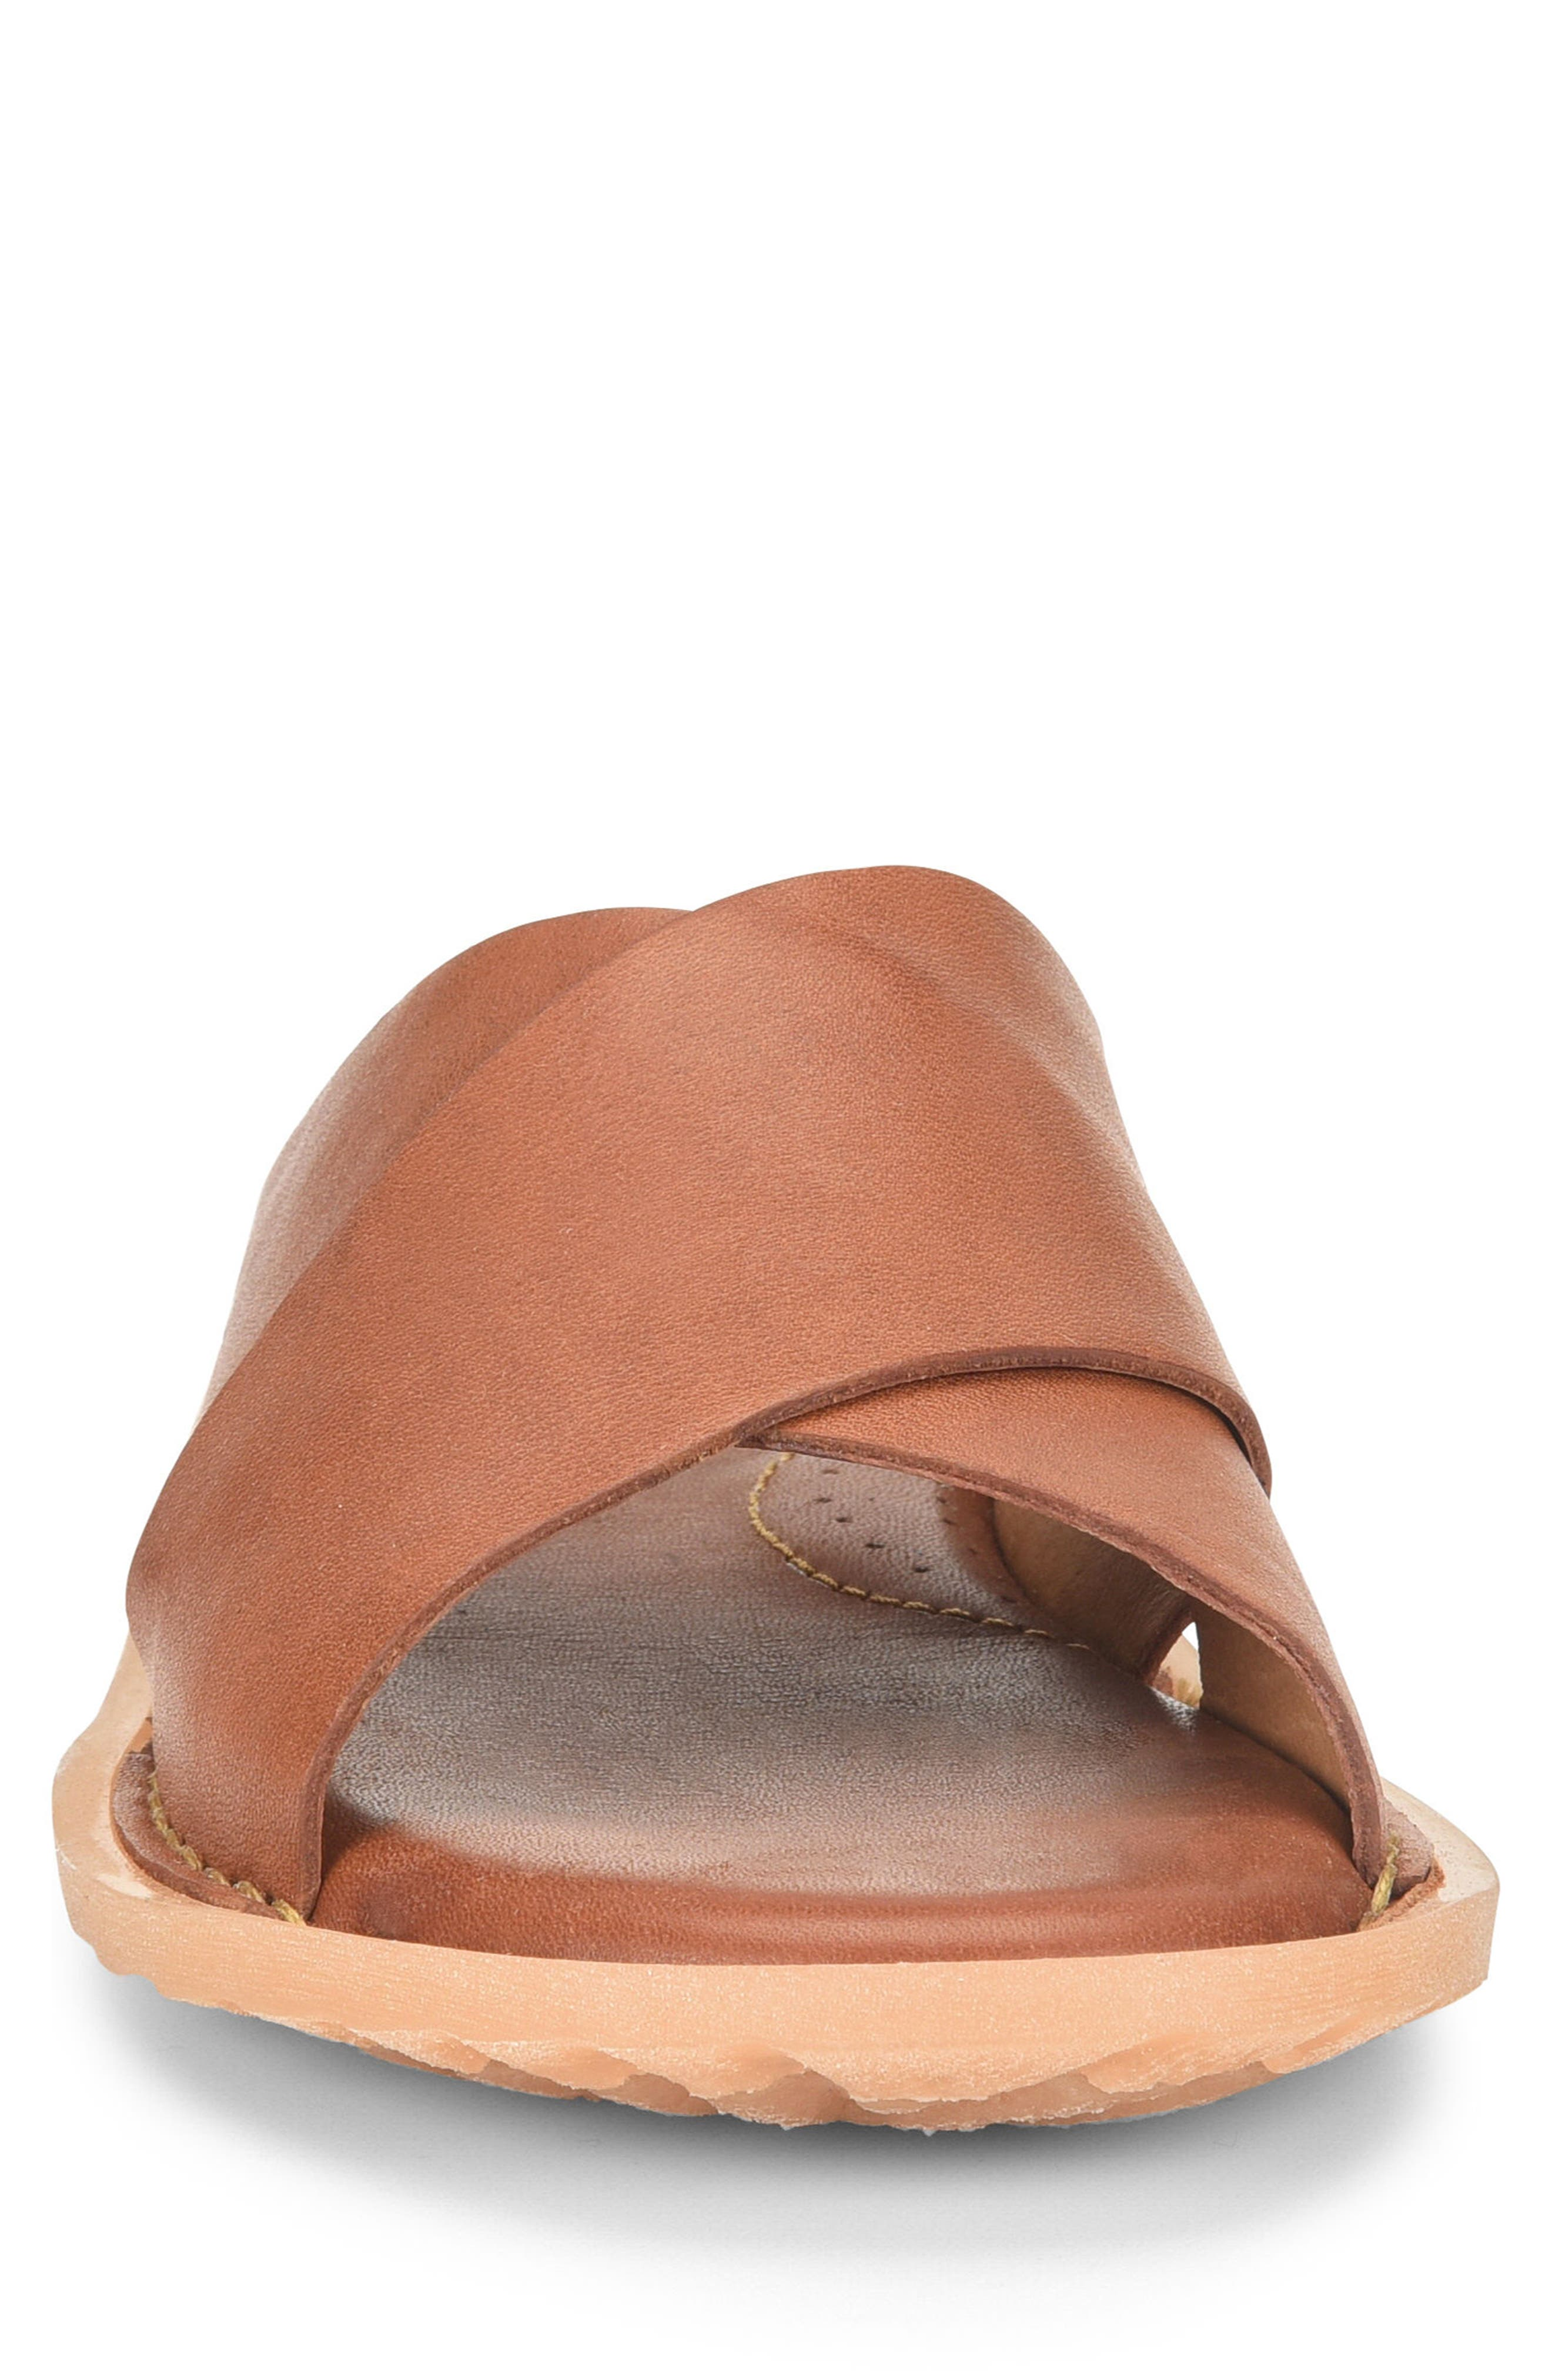 Getaway Slide Sandal,                             Alternate thumbnail 4, color,                             Rust Leather